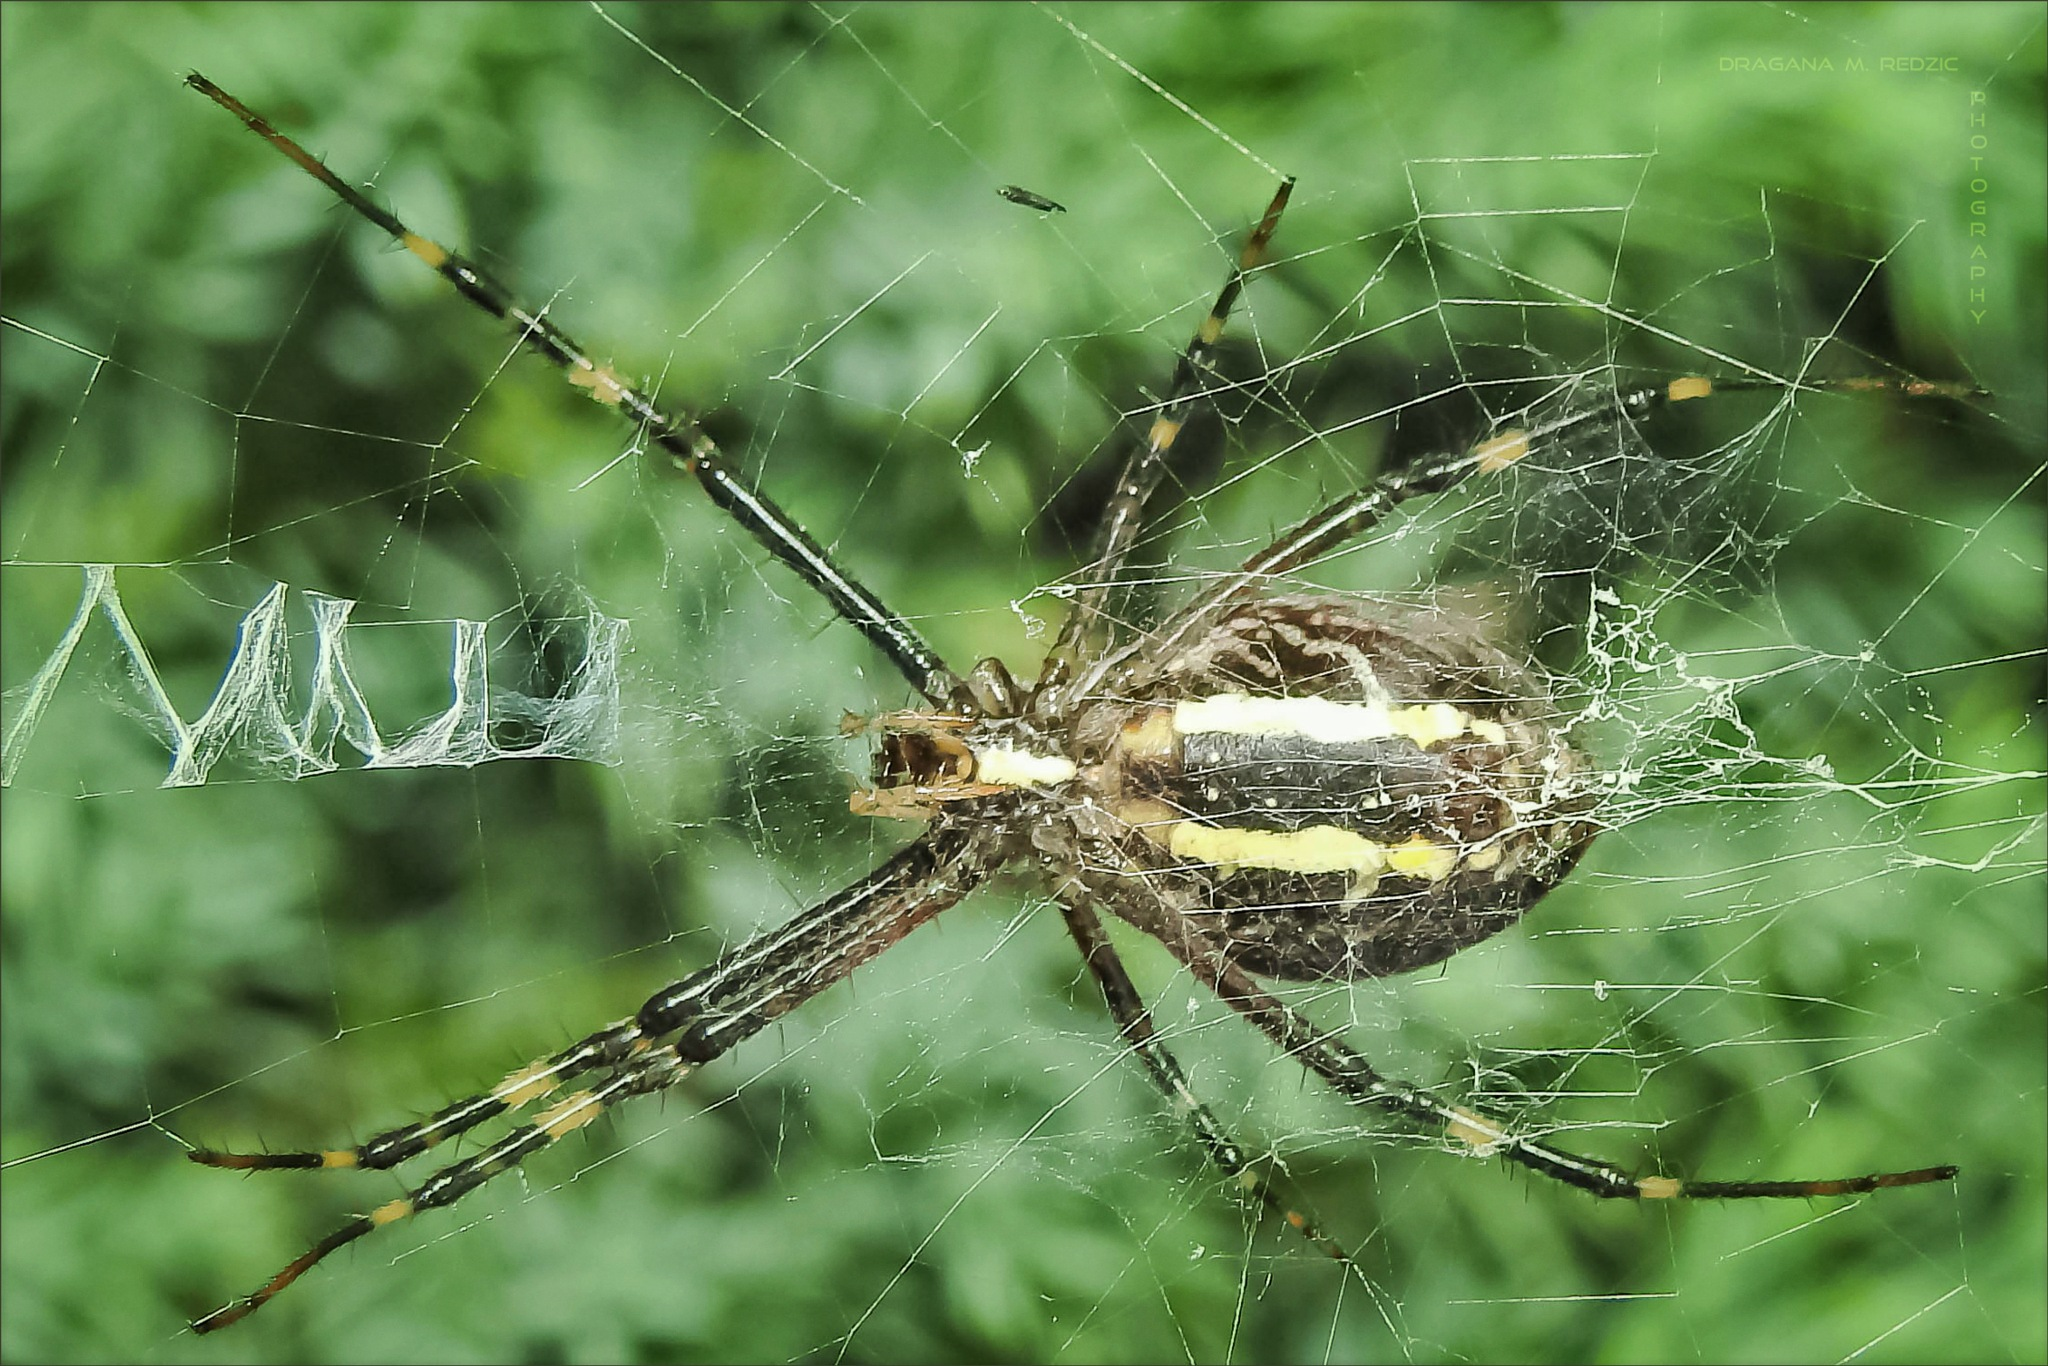 Pauk Osa (ženka - pogled odozdo) ~ Spider Wasp (female - view from below) ~ Argiope bruennichi (f.)L by Драгана М. Реџић